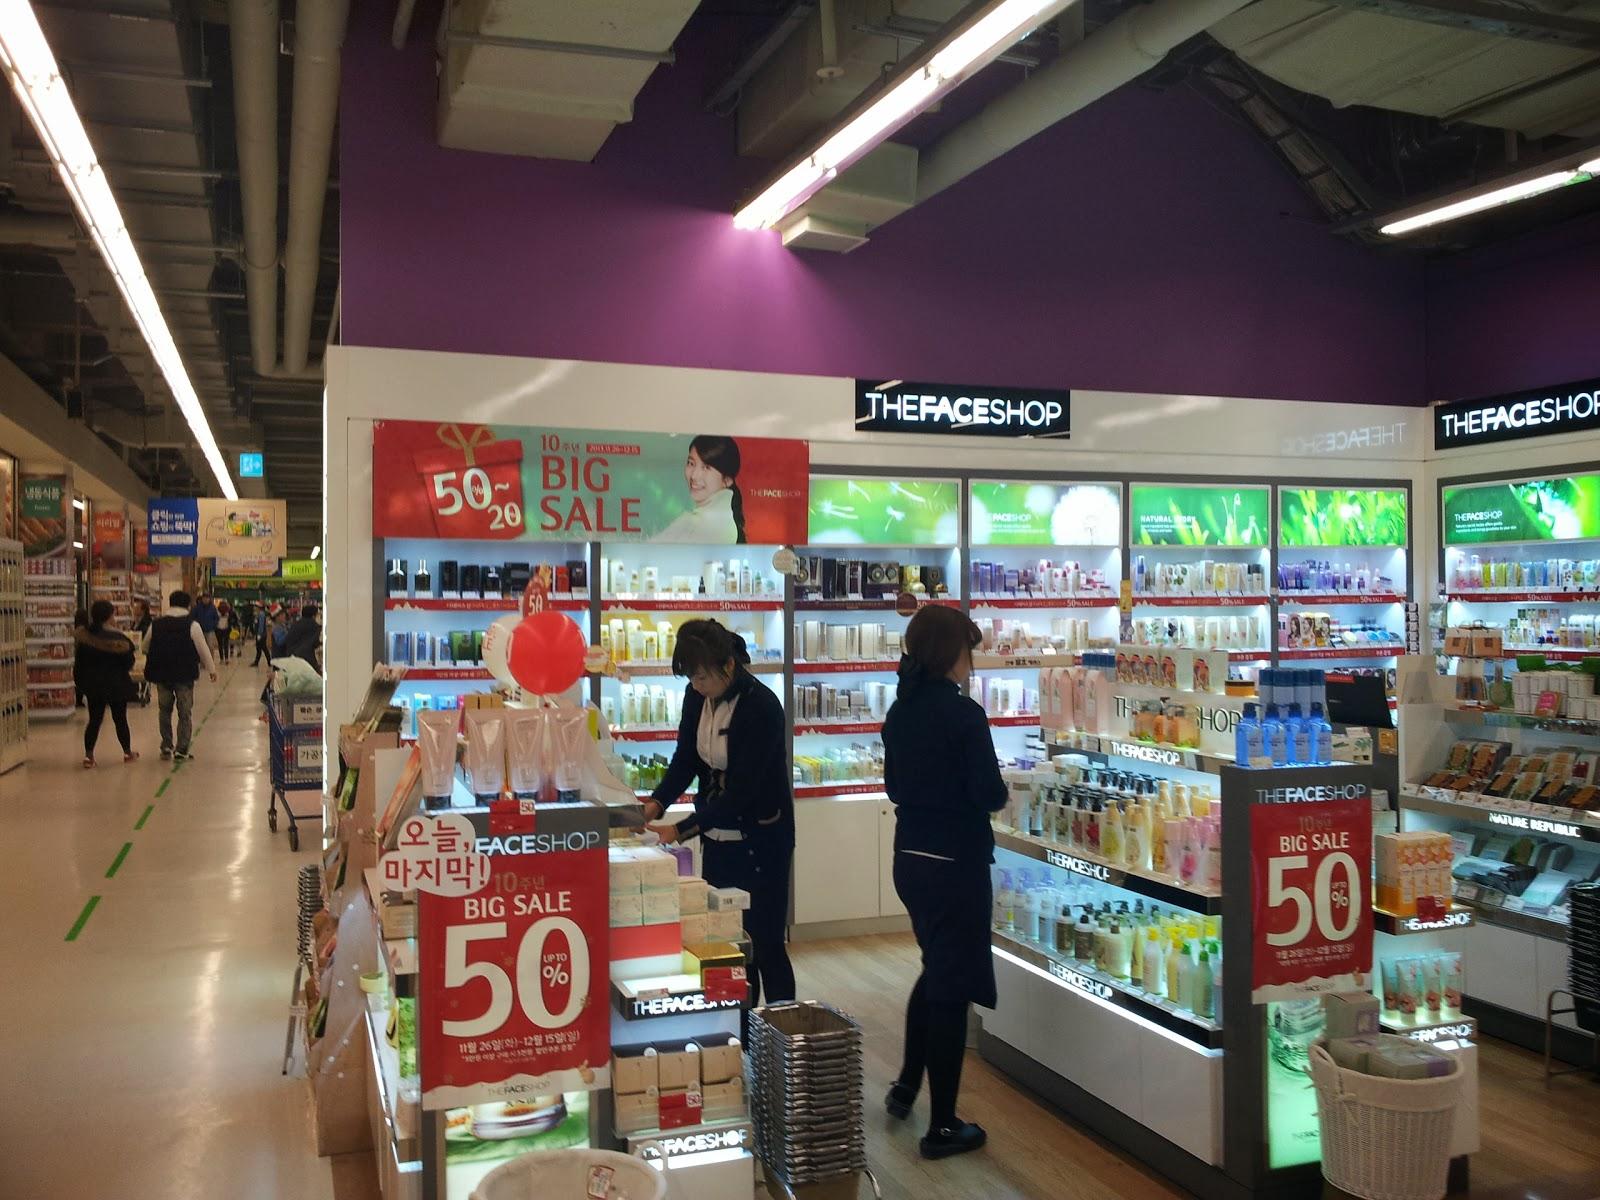 Hasil gambar untuk discount kosmetik di Myeong Dong